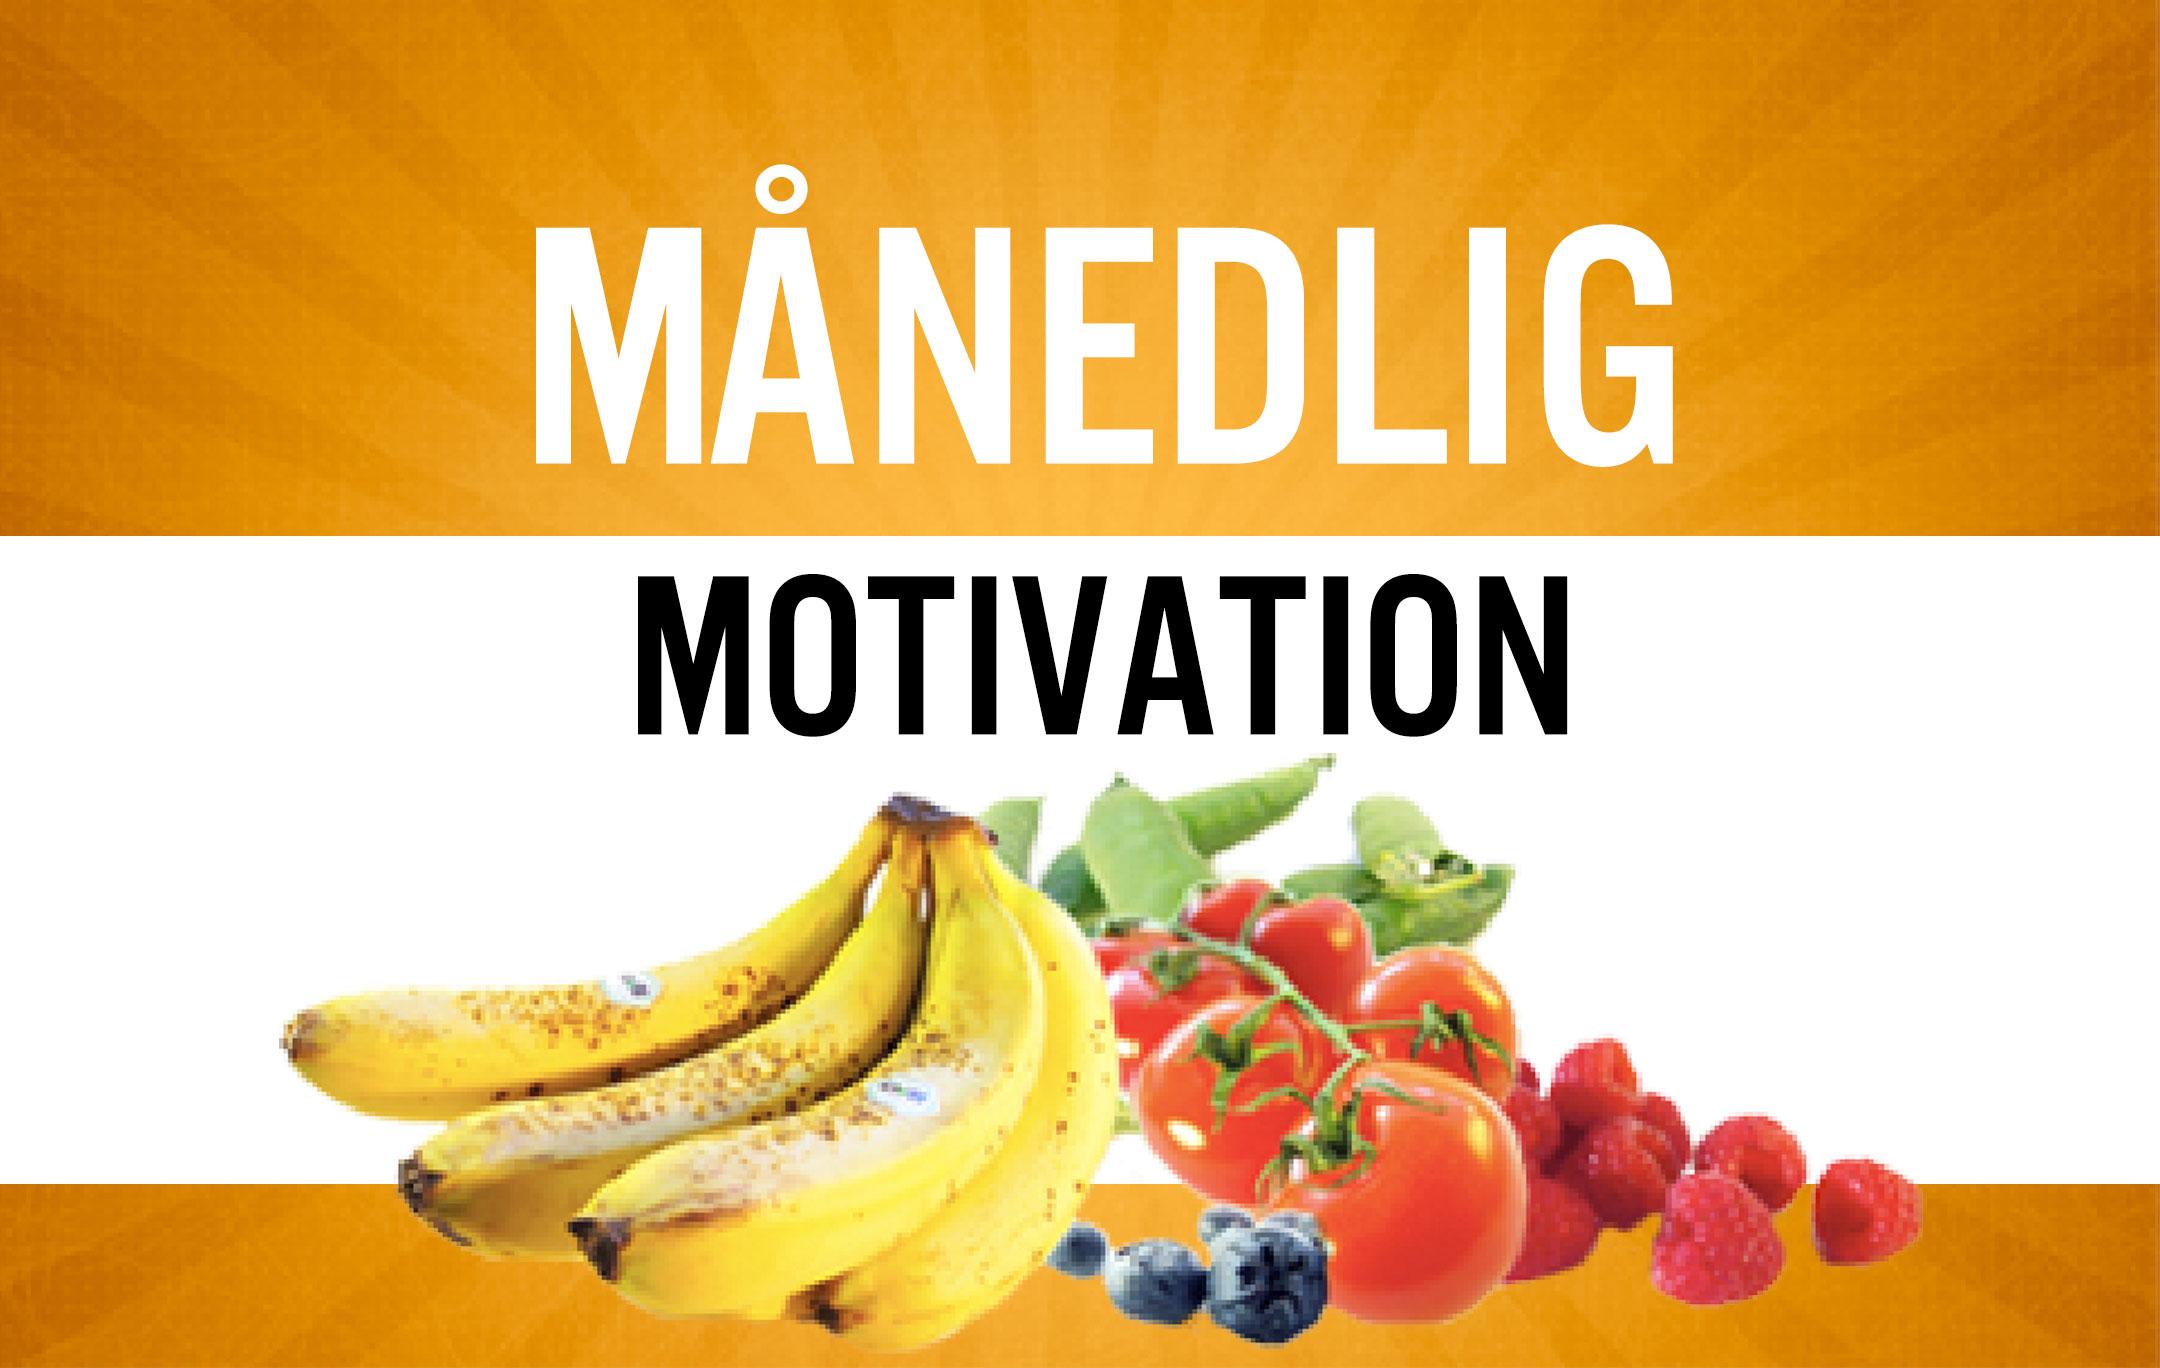 Månedlig motivation